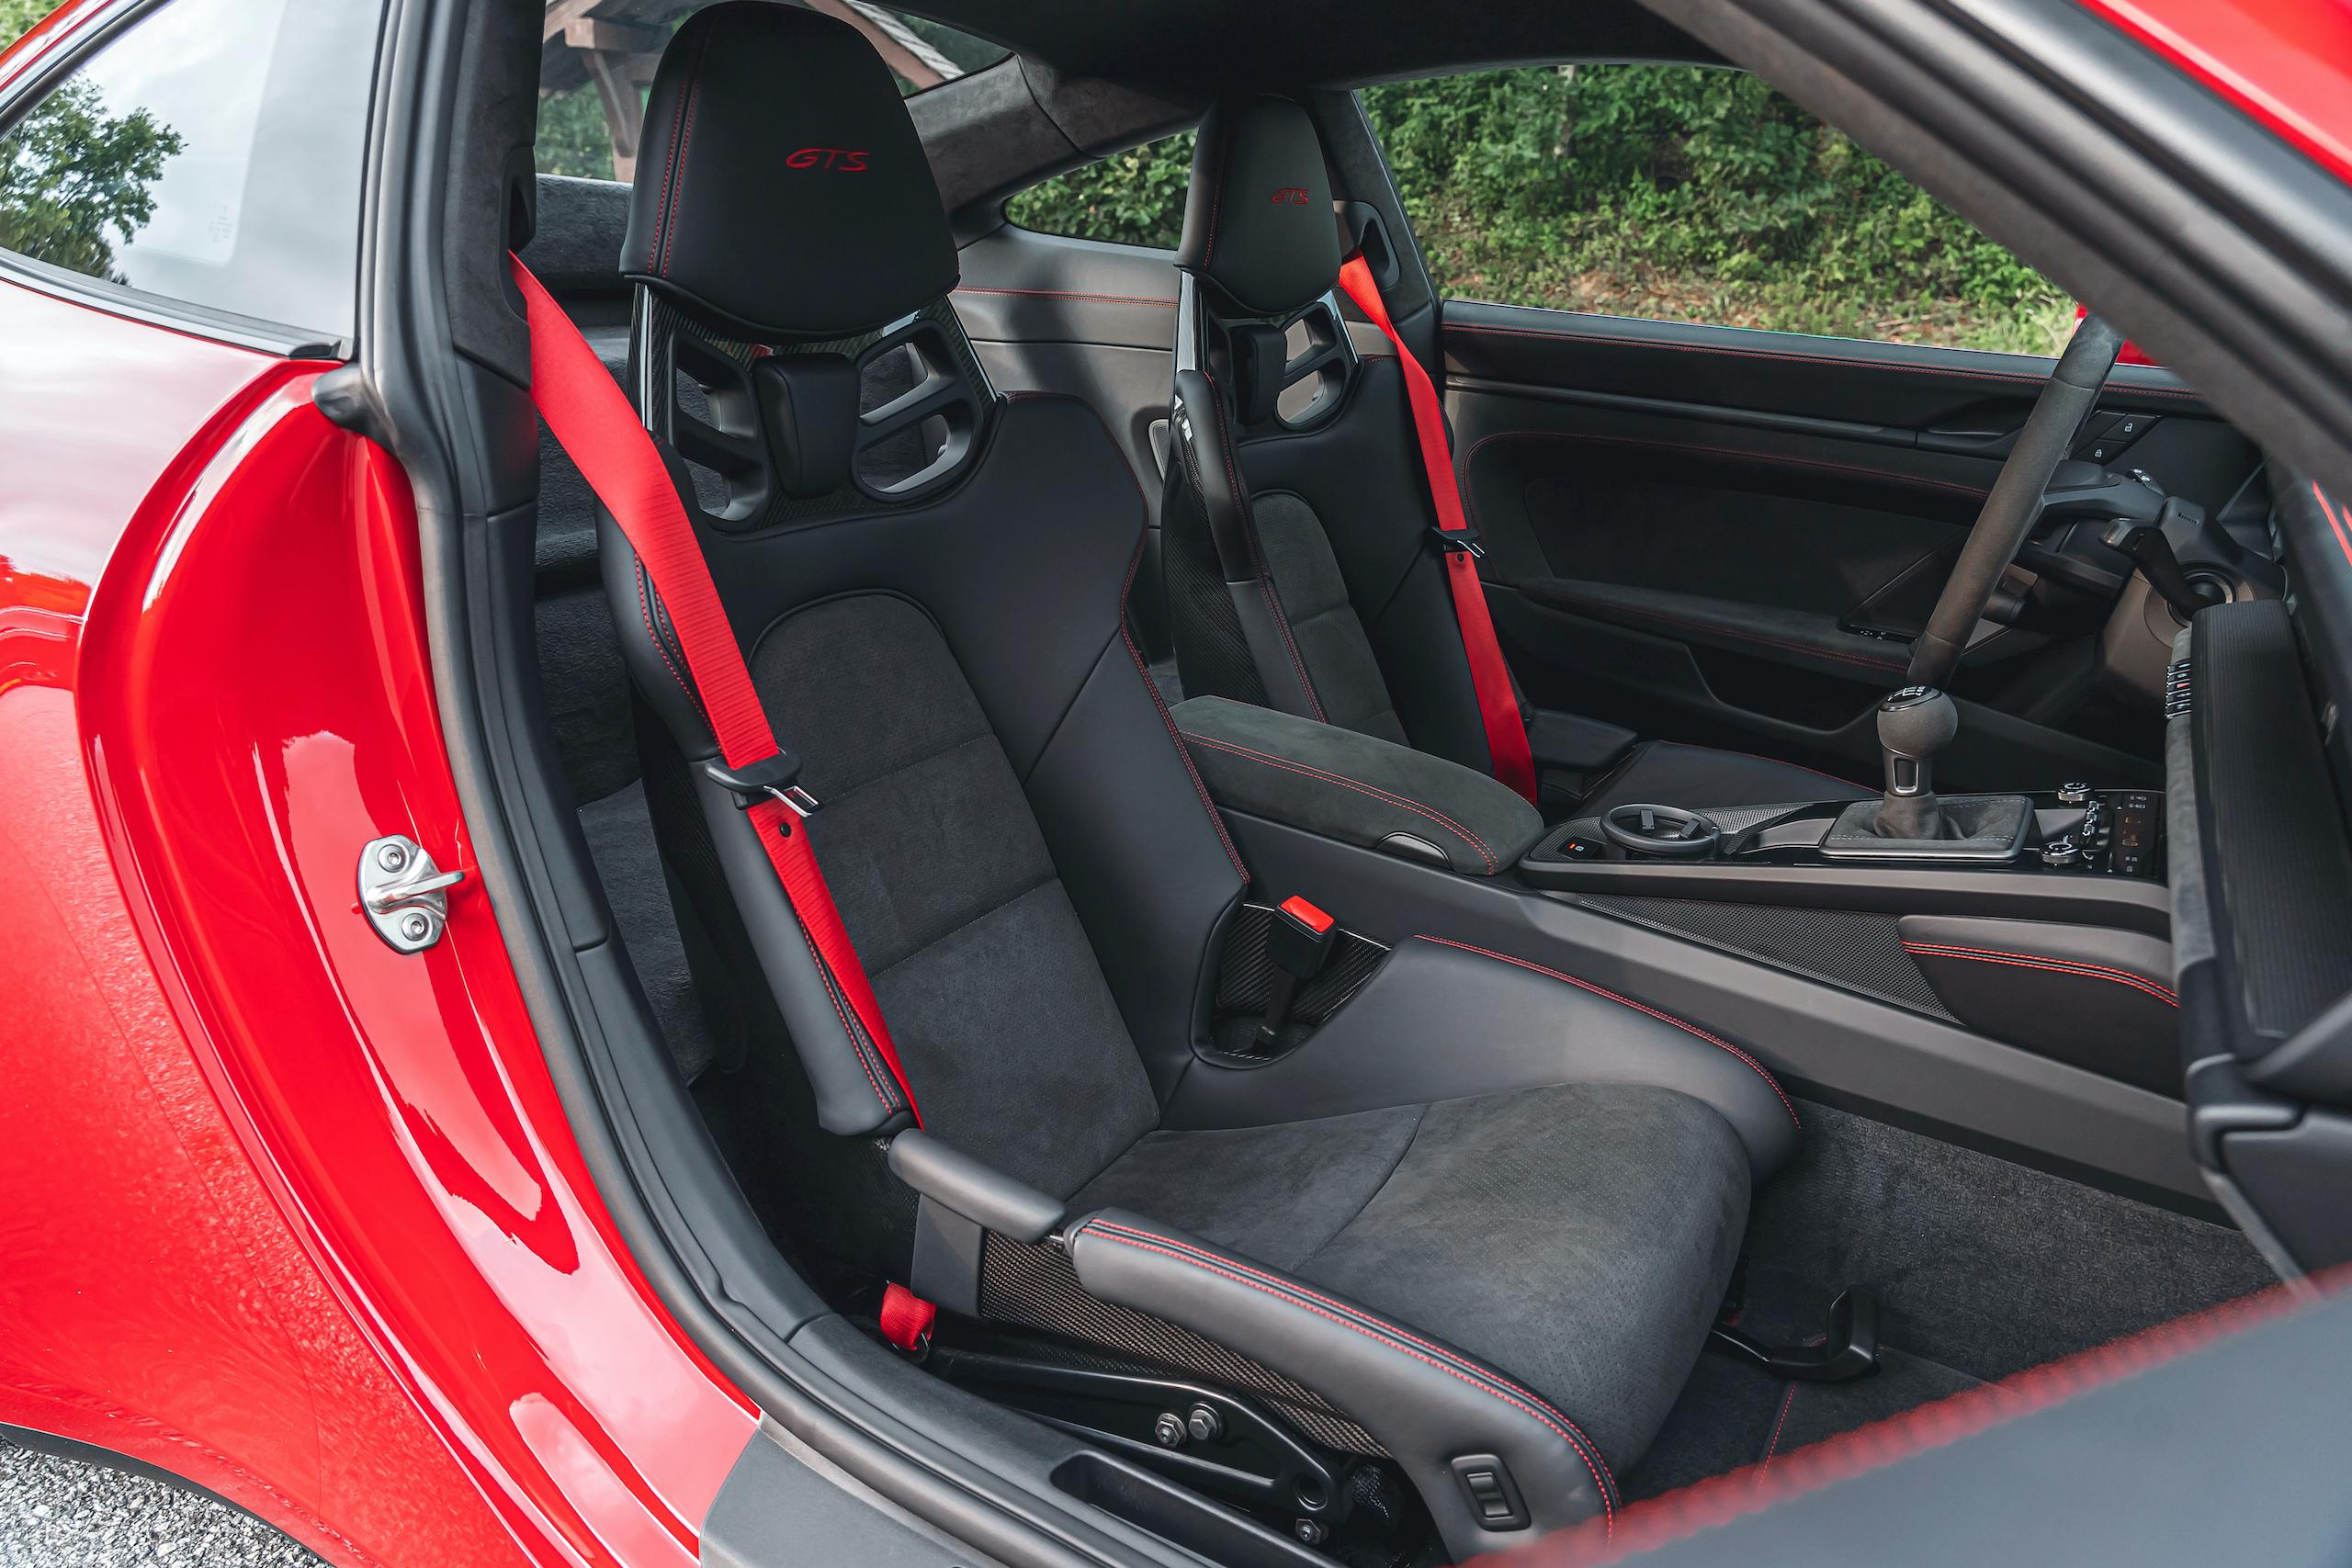 Porsche 911 GTS interior front seats